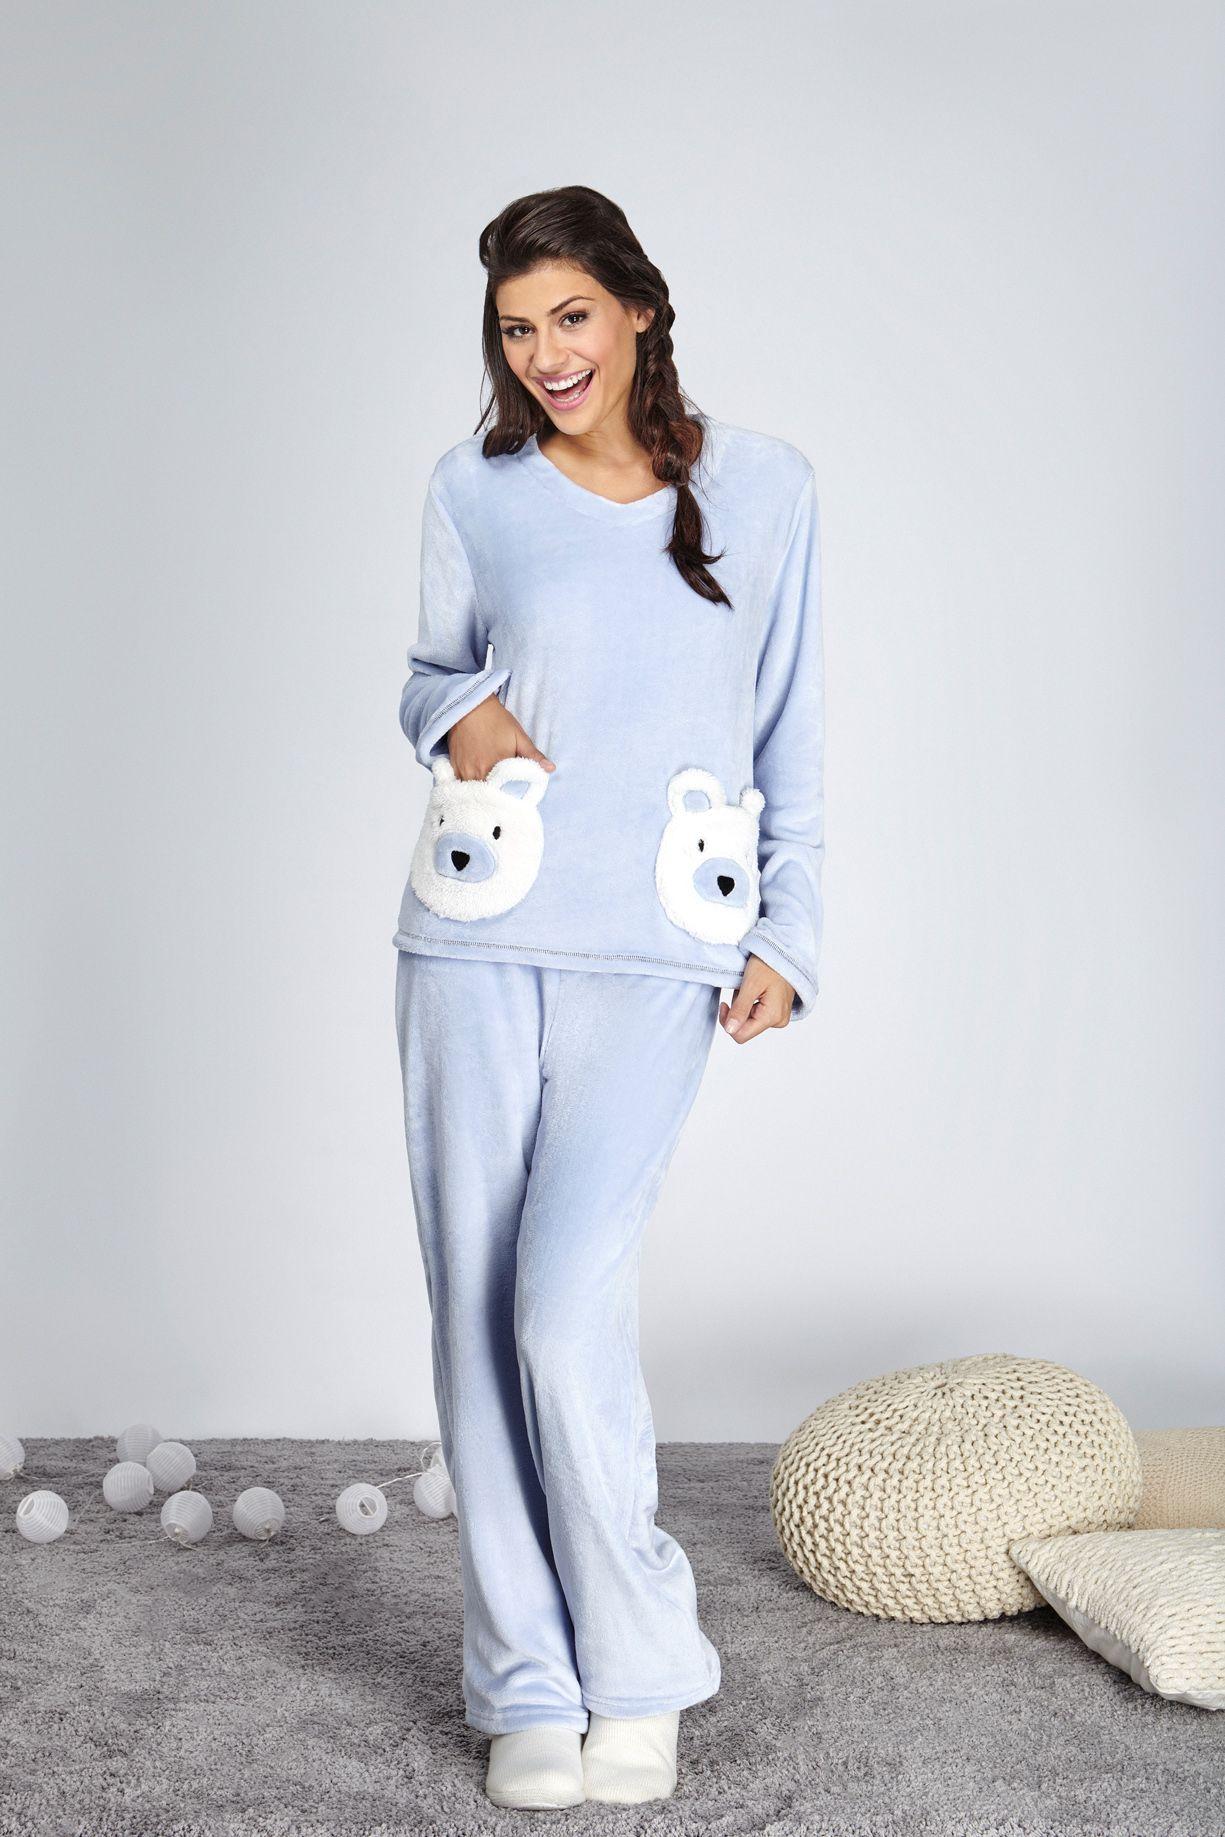 Pijamas fofos que estamos amando, A cor é relaxante, para noites perfeitas e tecido super macio para sonhar muito!